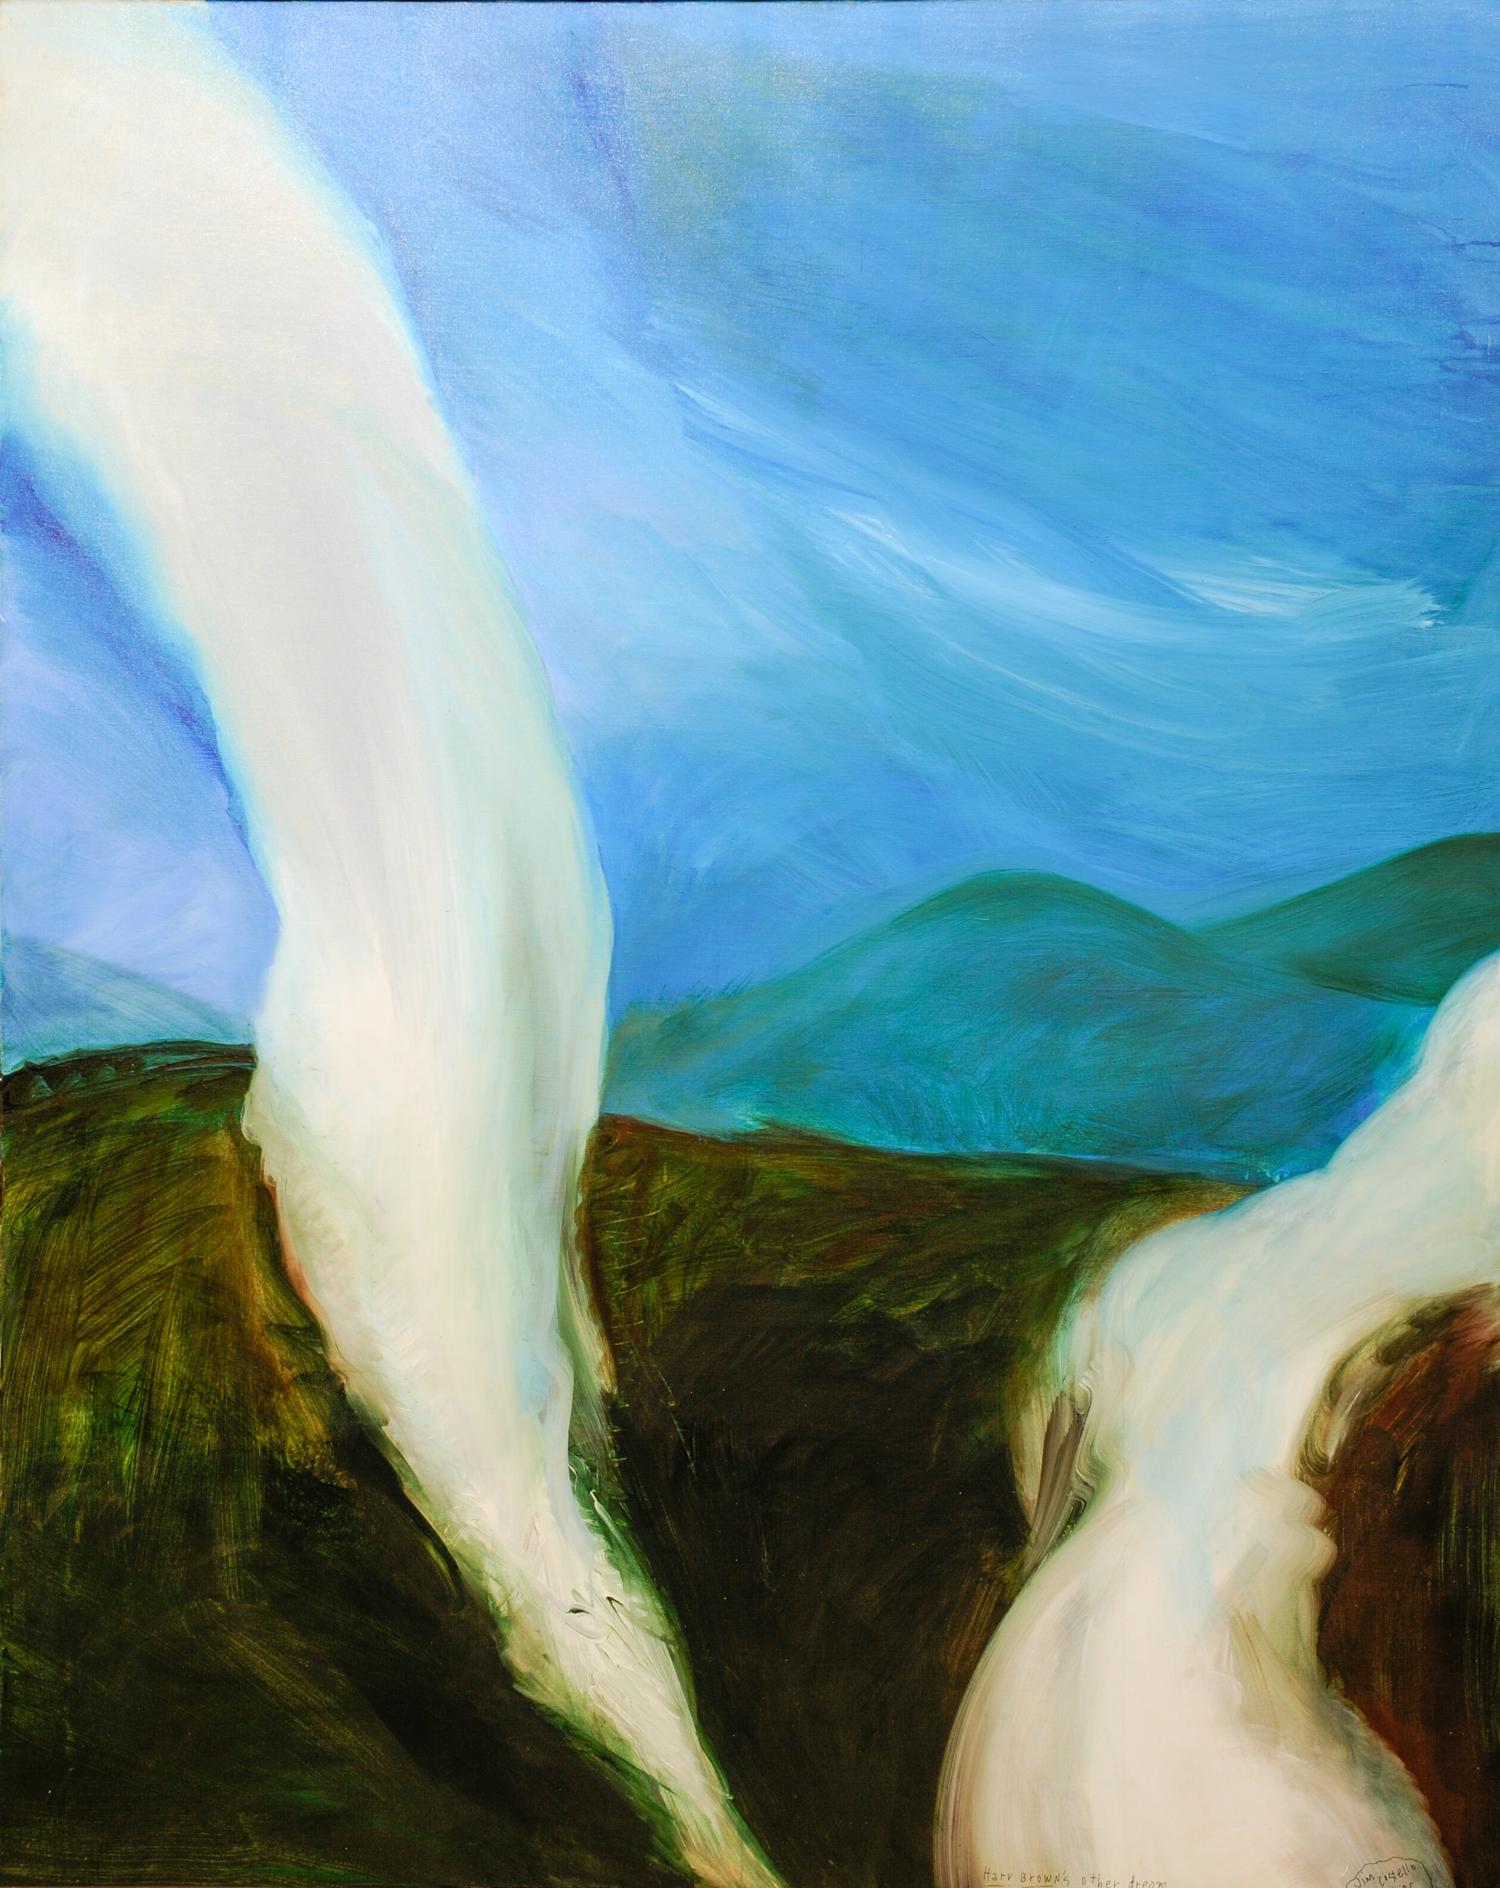 painting_1985_Harv_Brown's_Other_Dream_lg.jpg